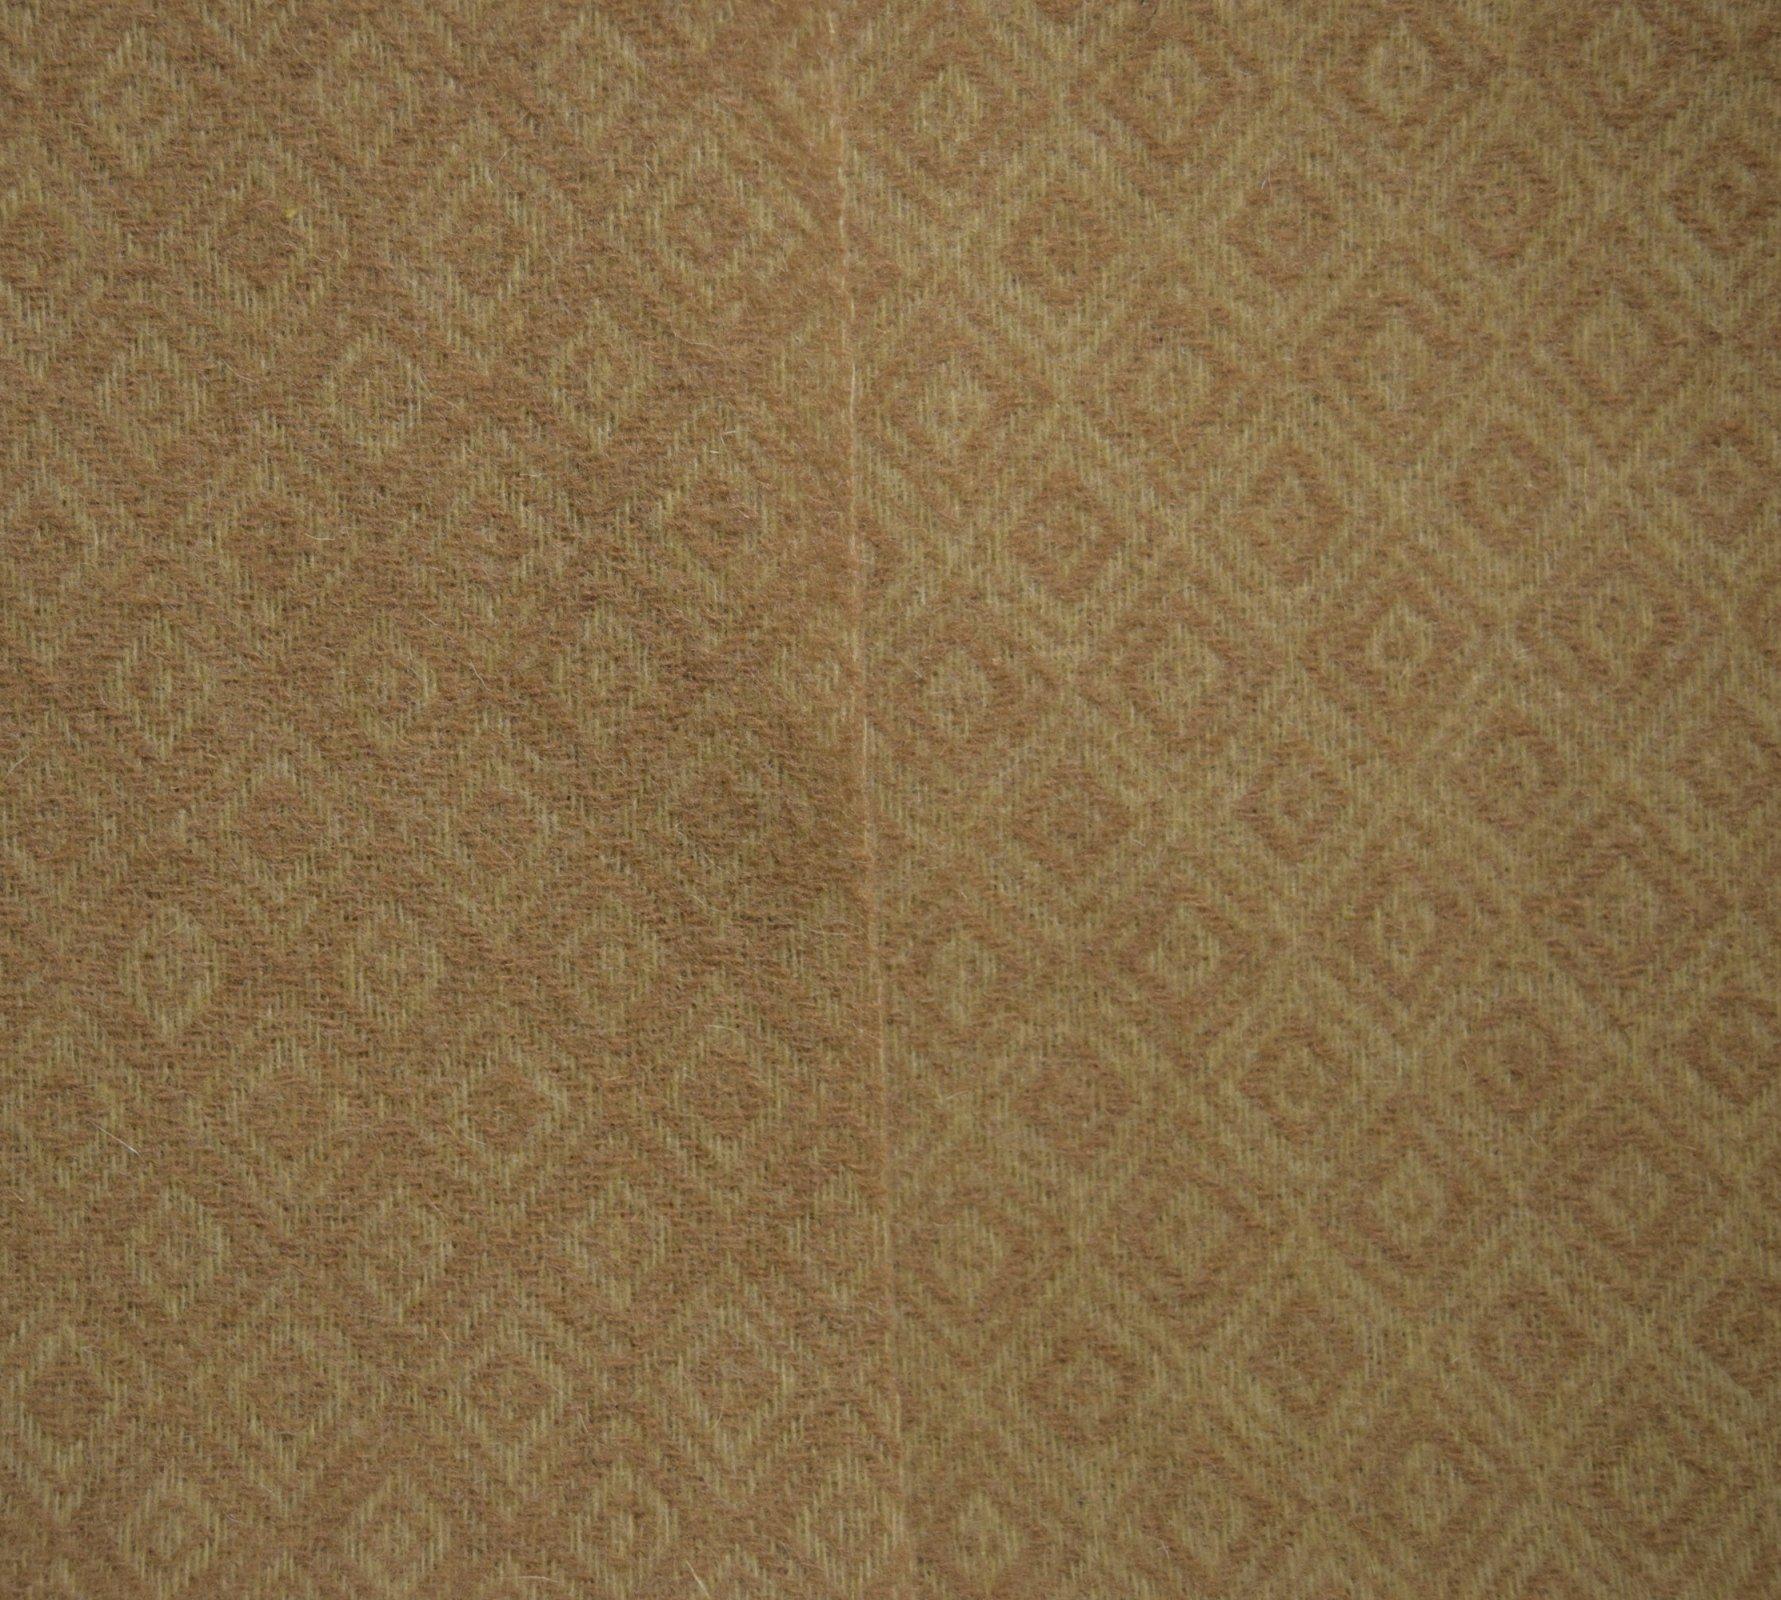 Tortoise  9 X 14 100% Wool Reversible